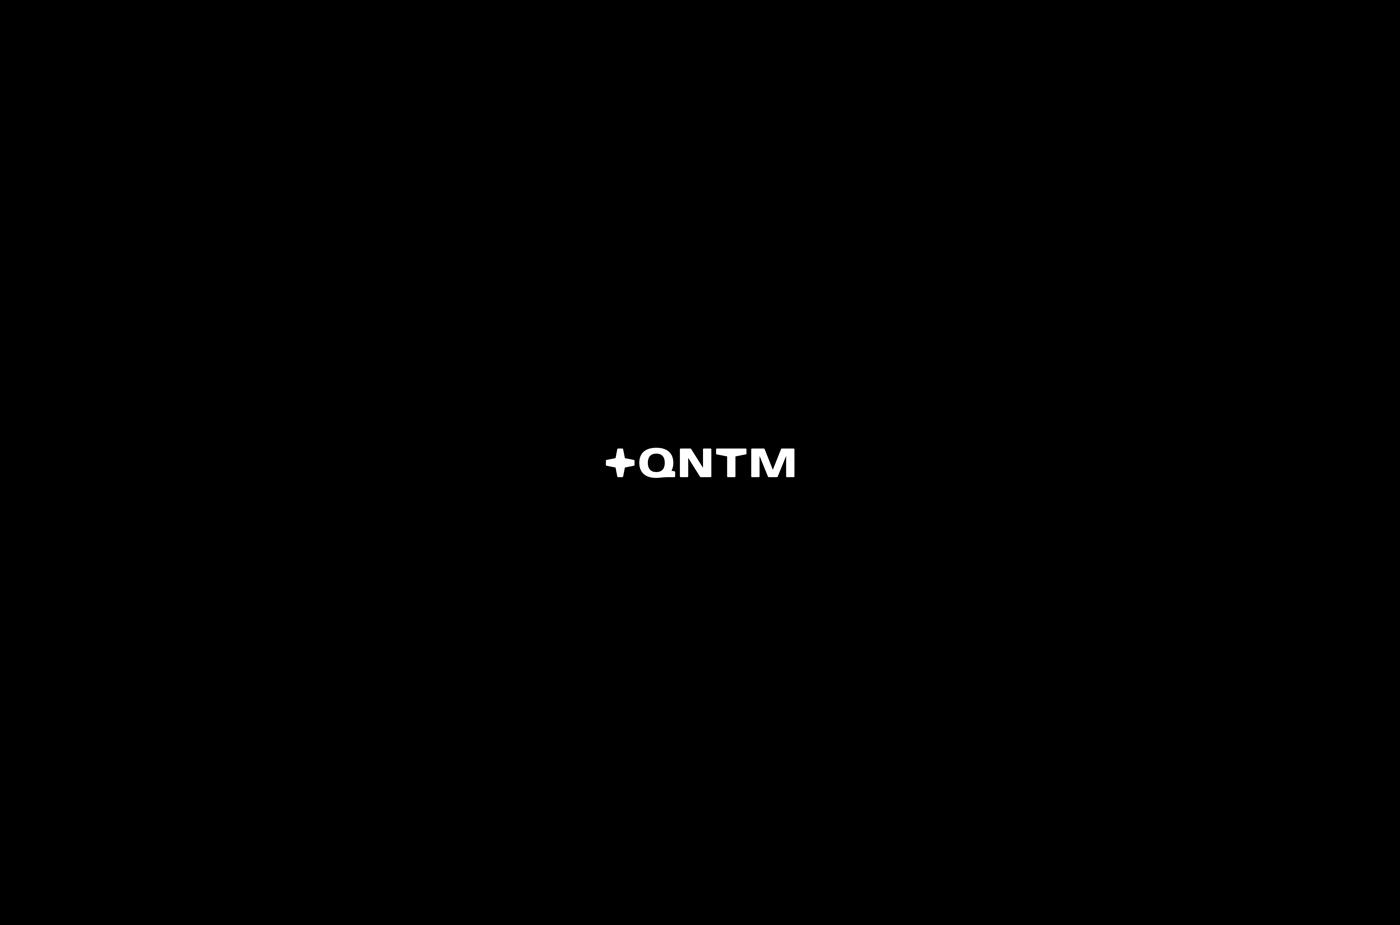 +Qntm.png